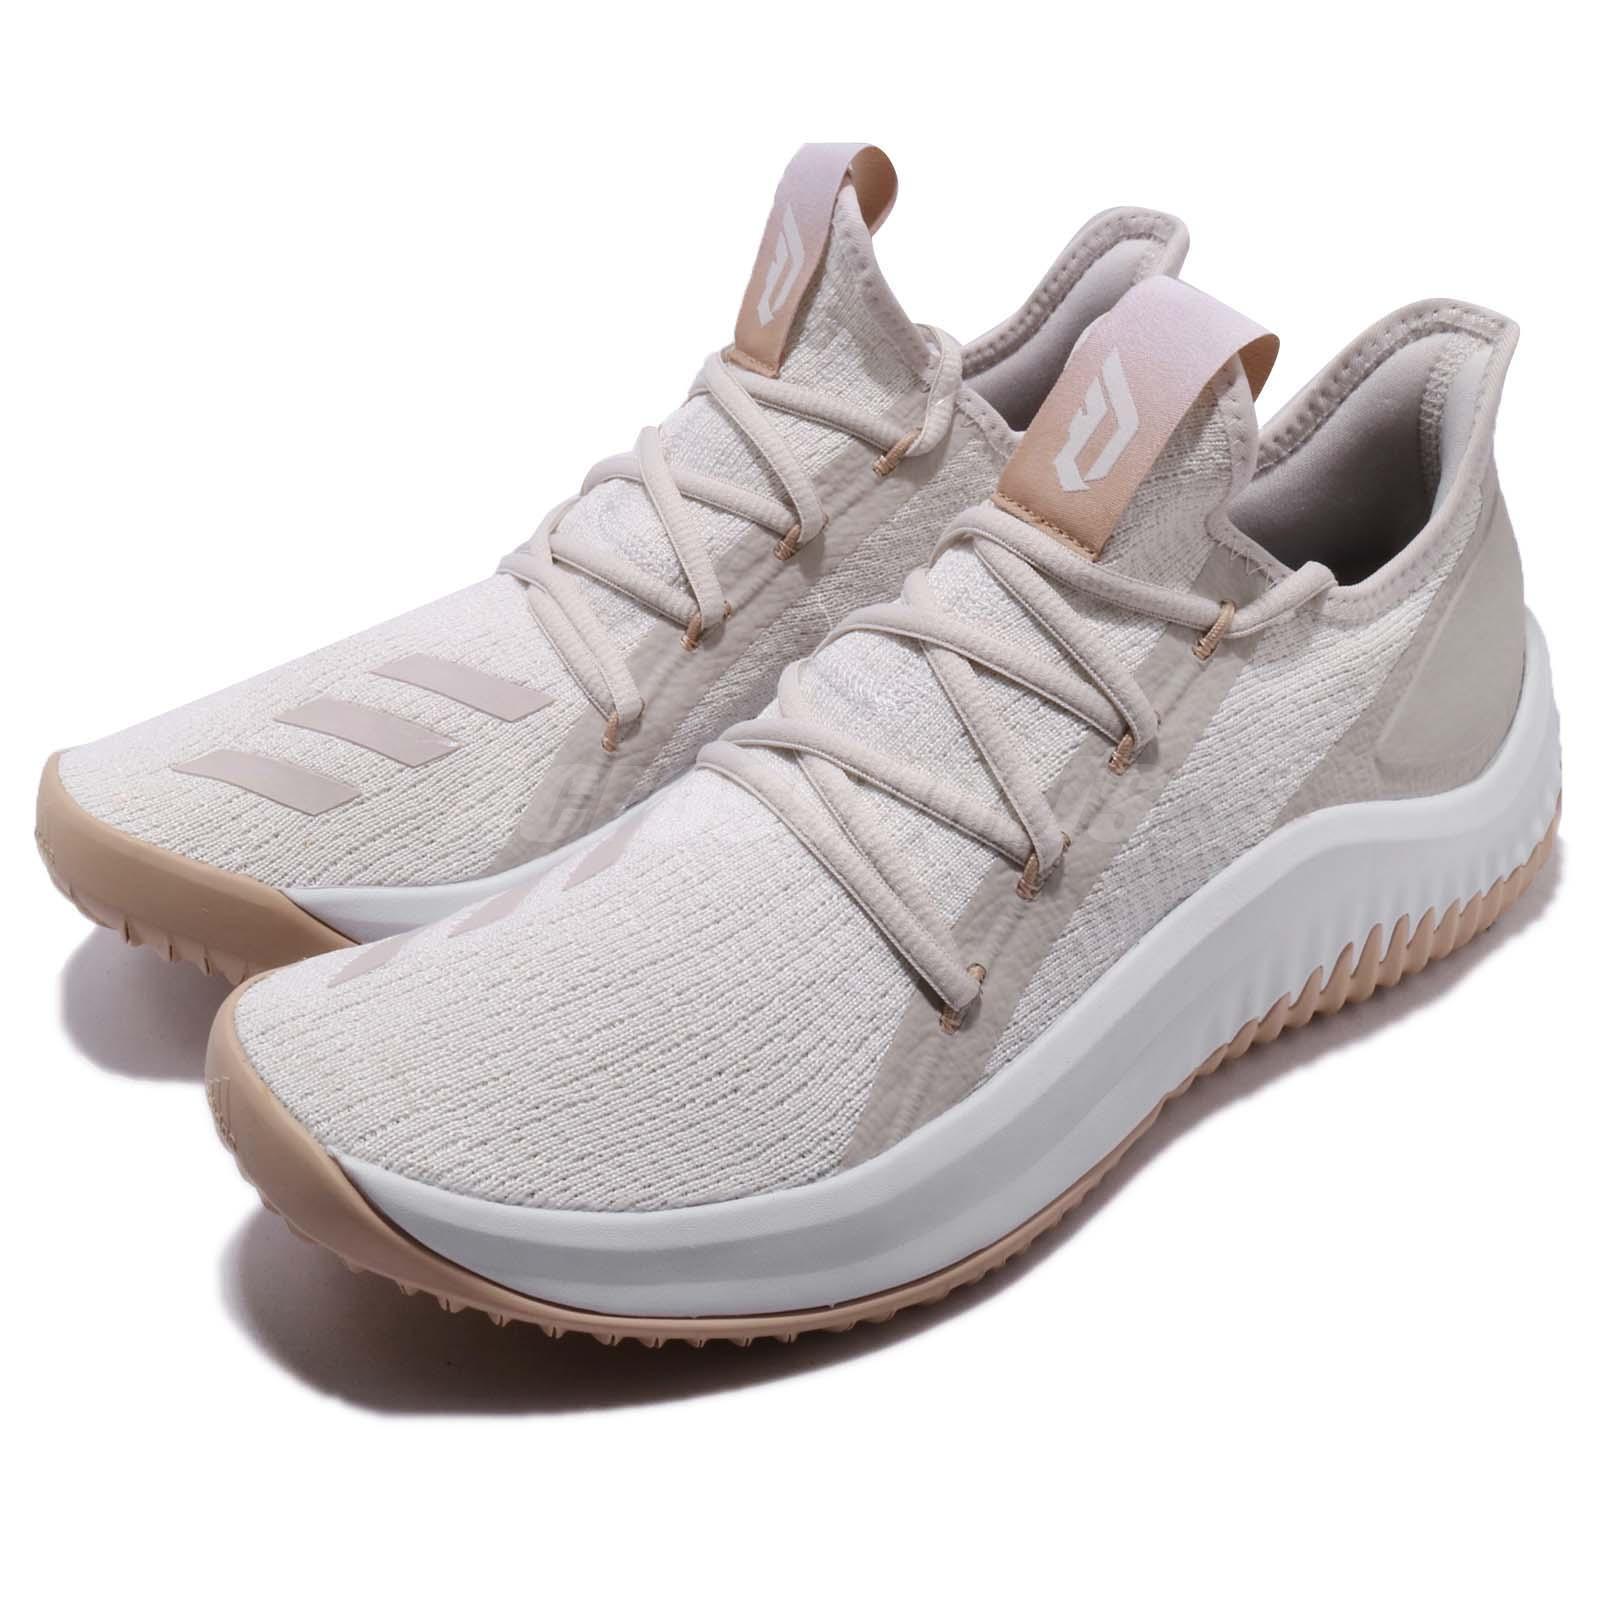 adidas Dame D.O.L.L.A. Damian Lillard Crystal blanc  Basketball Chaussures DB1074